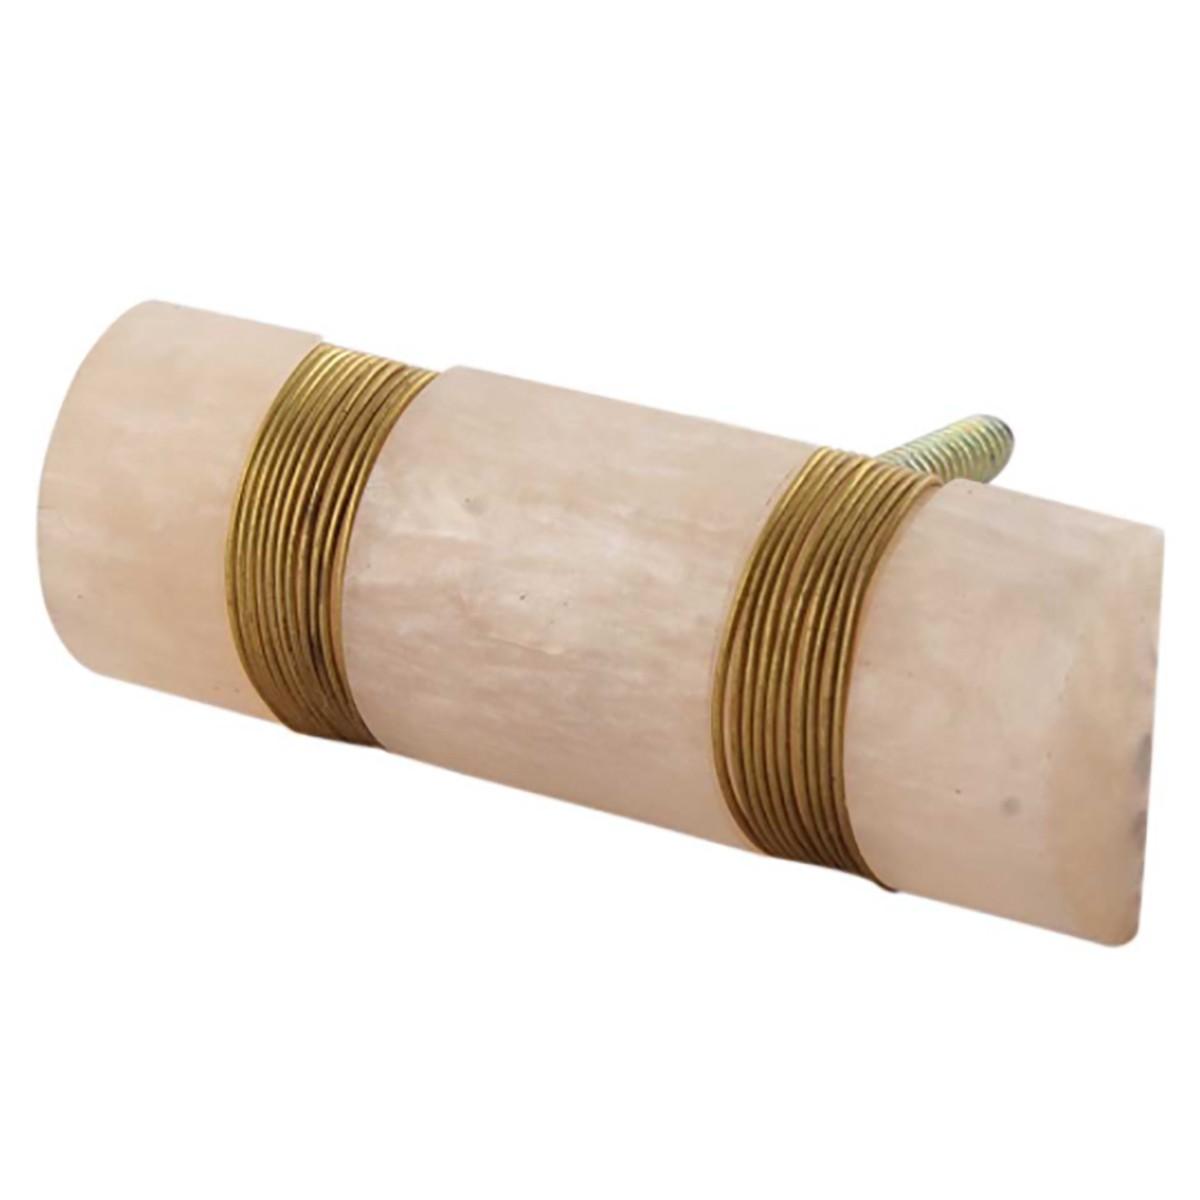 Bouton De Meuble Tube En Resine Et Cuivre Scandinave